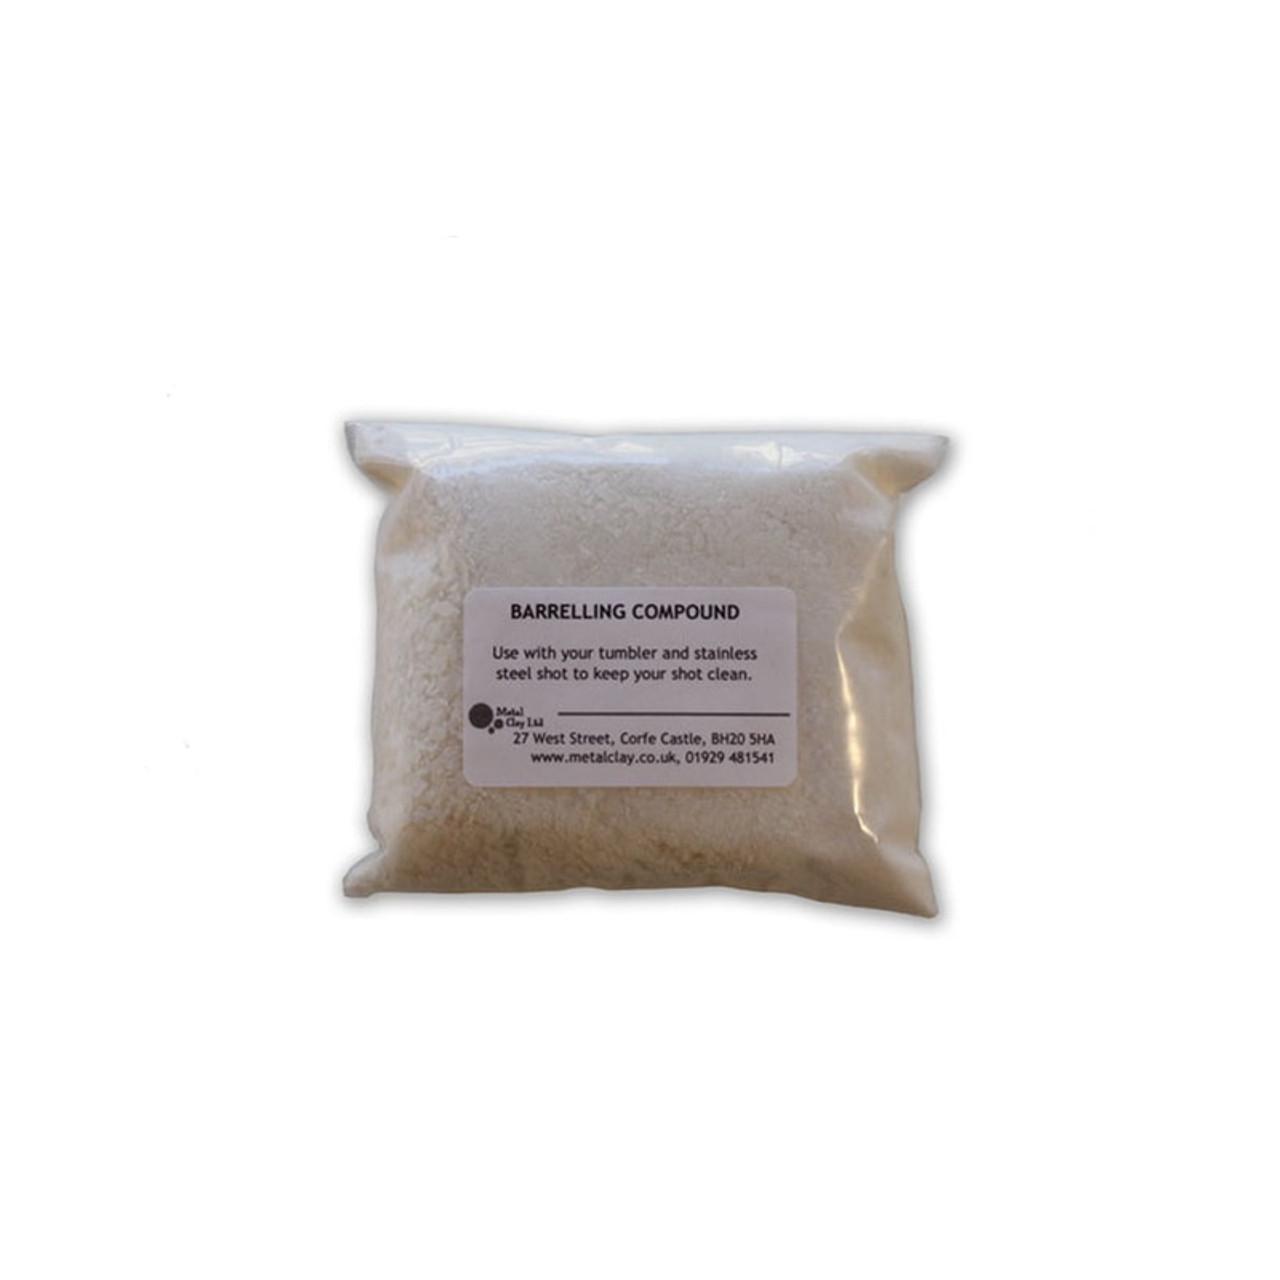 250gm Barrelbrite Barrelling Compound powder included in kit!